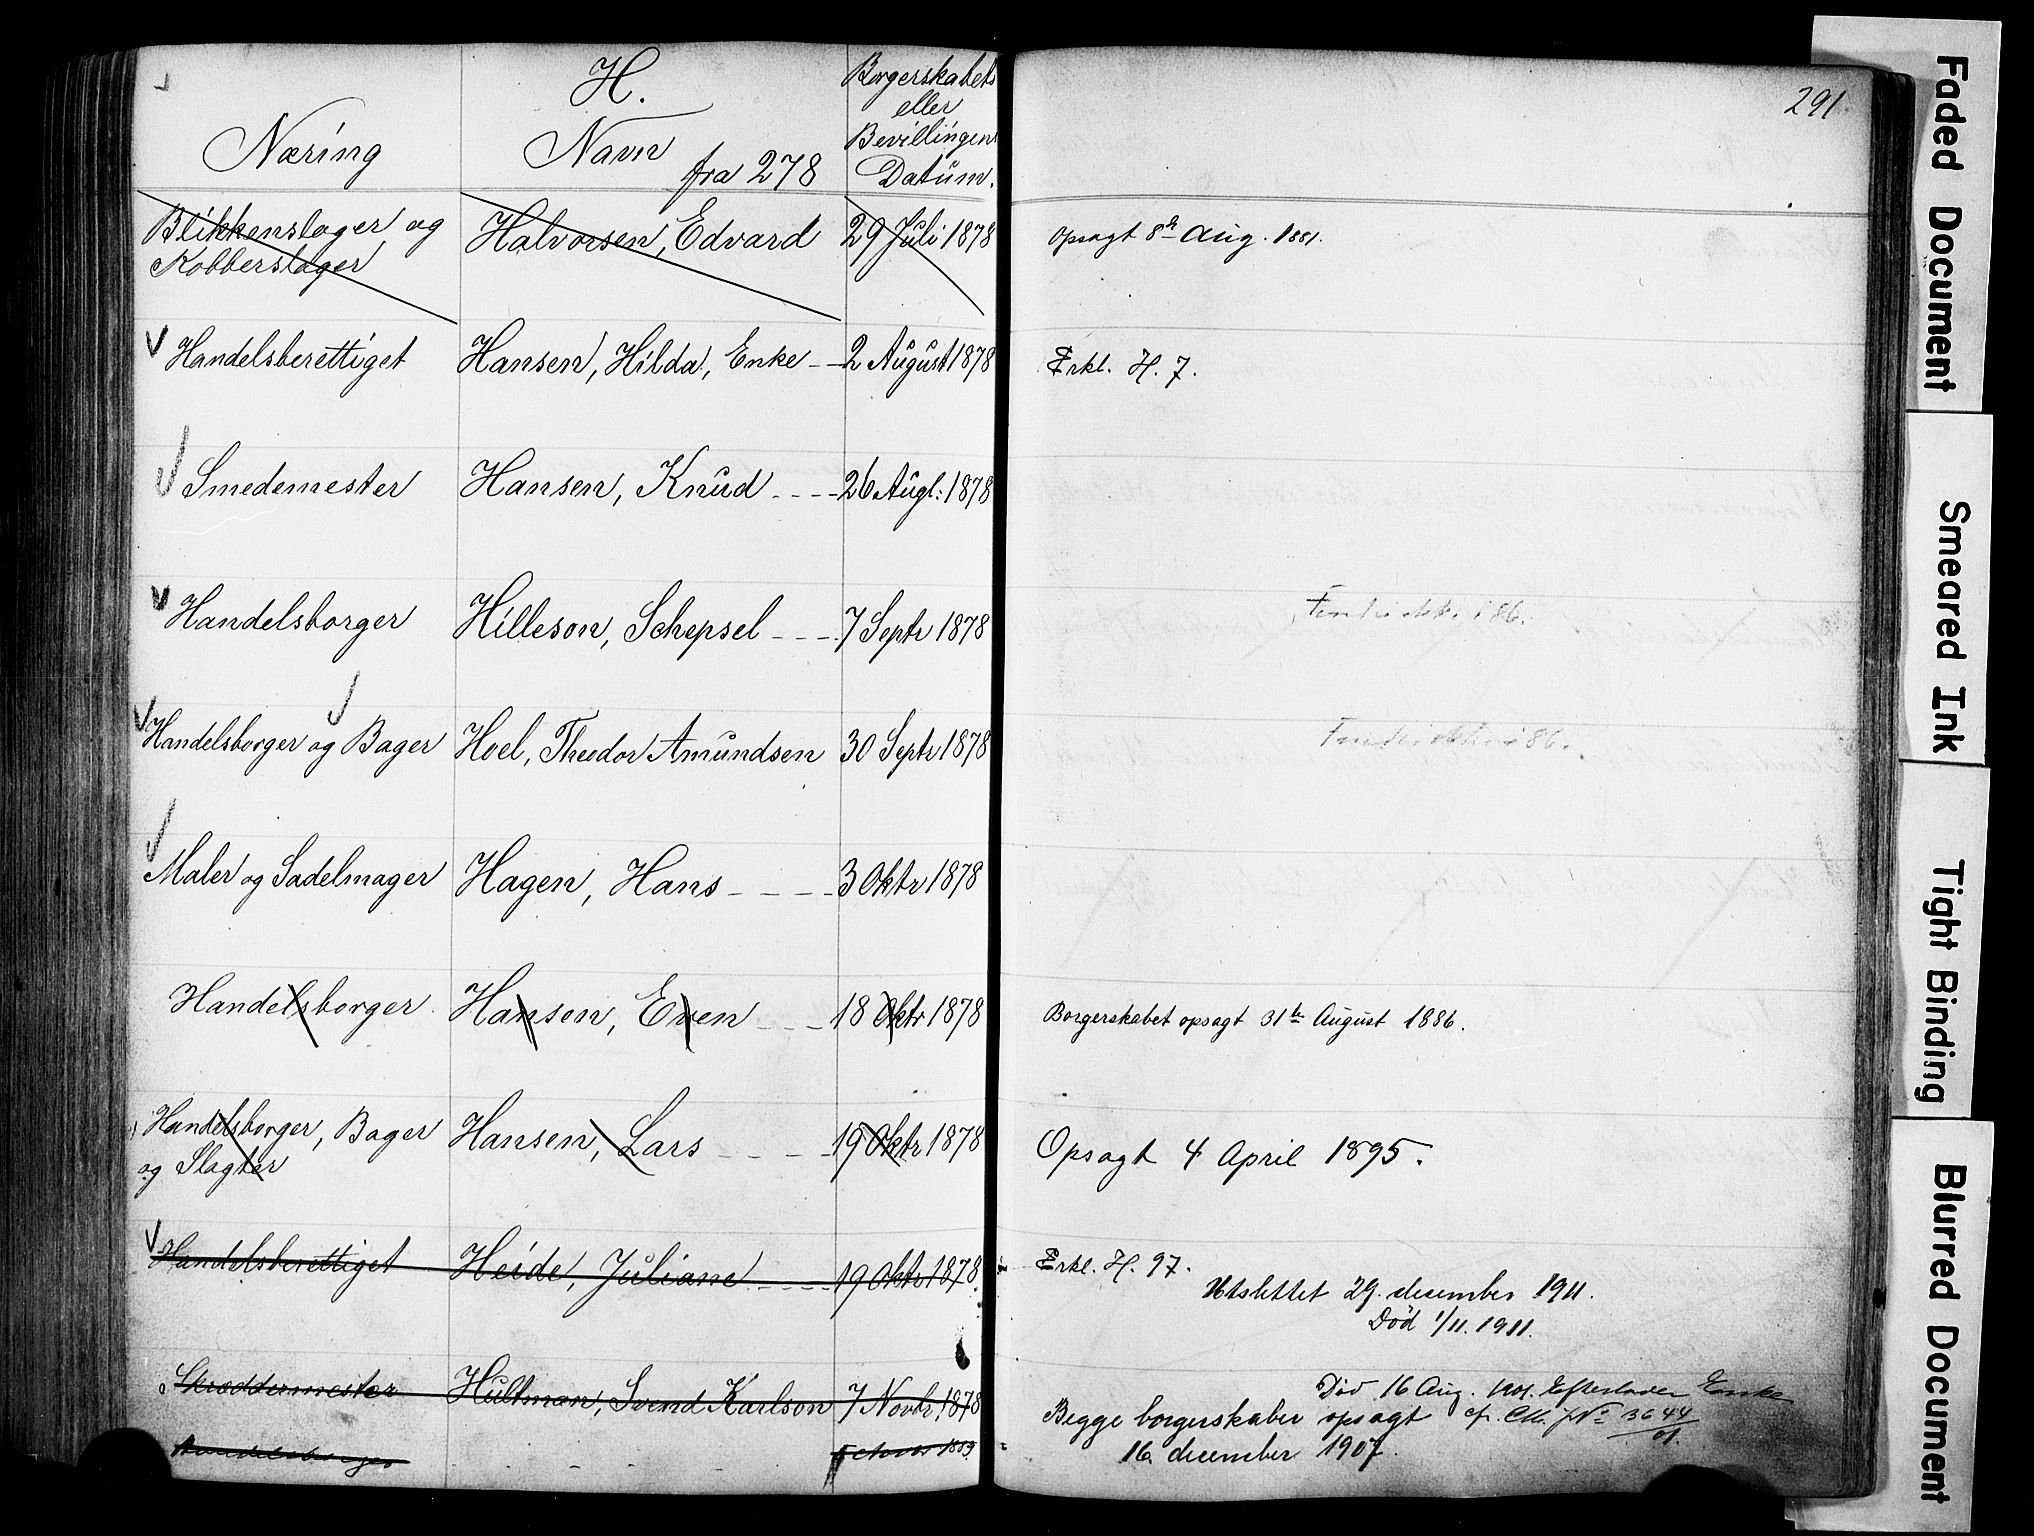 SAO, Kristiania magistrat, F/Fb/L0004: Borgerrulle, 1860-1879, s. 292